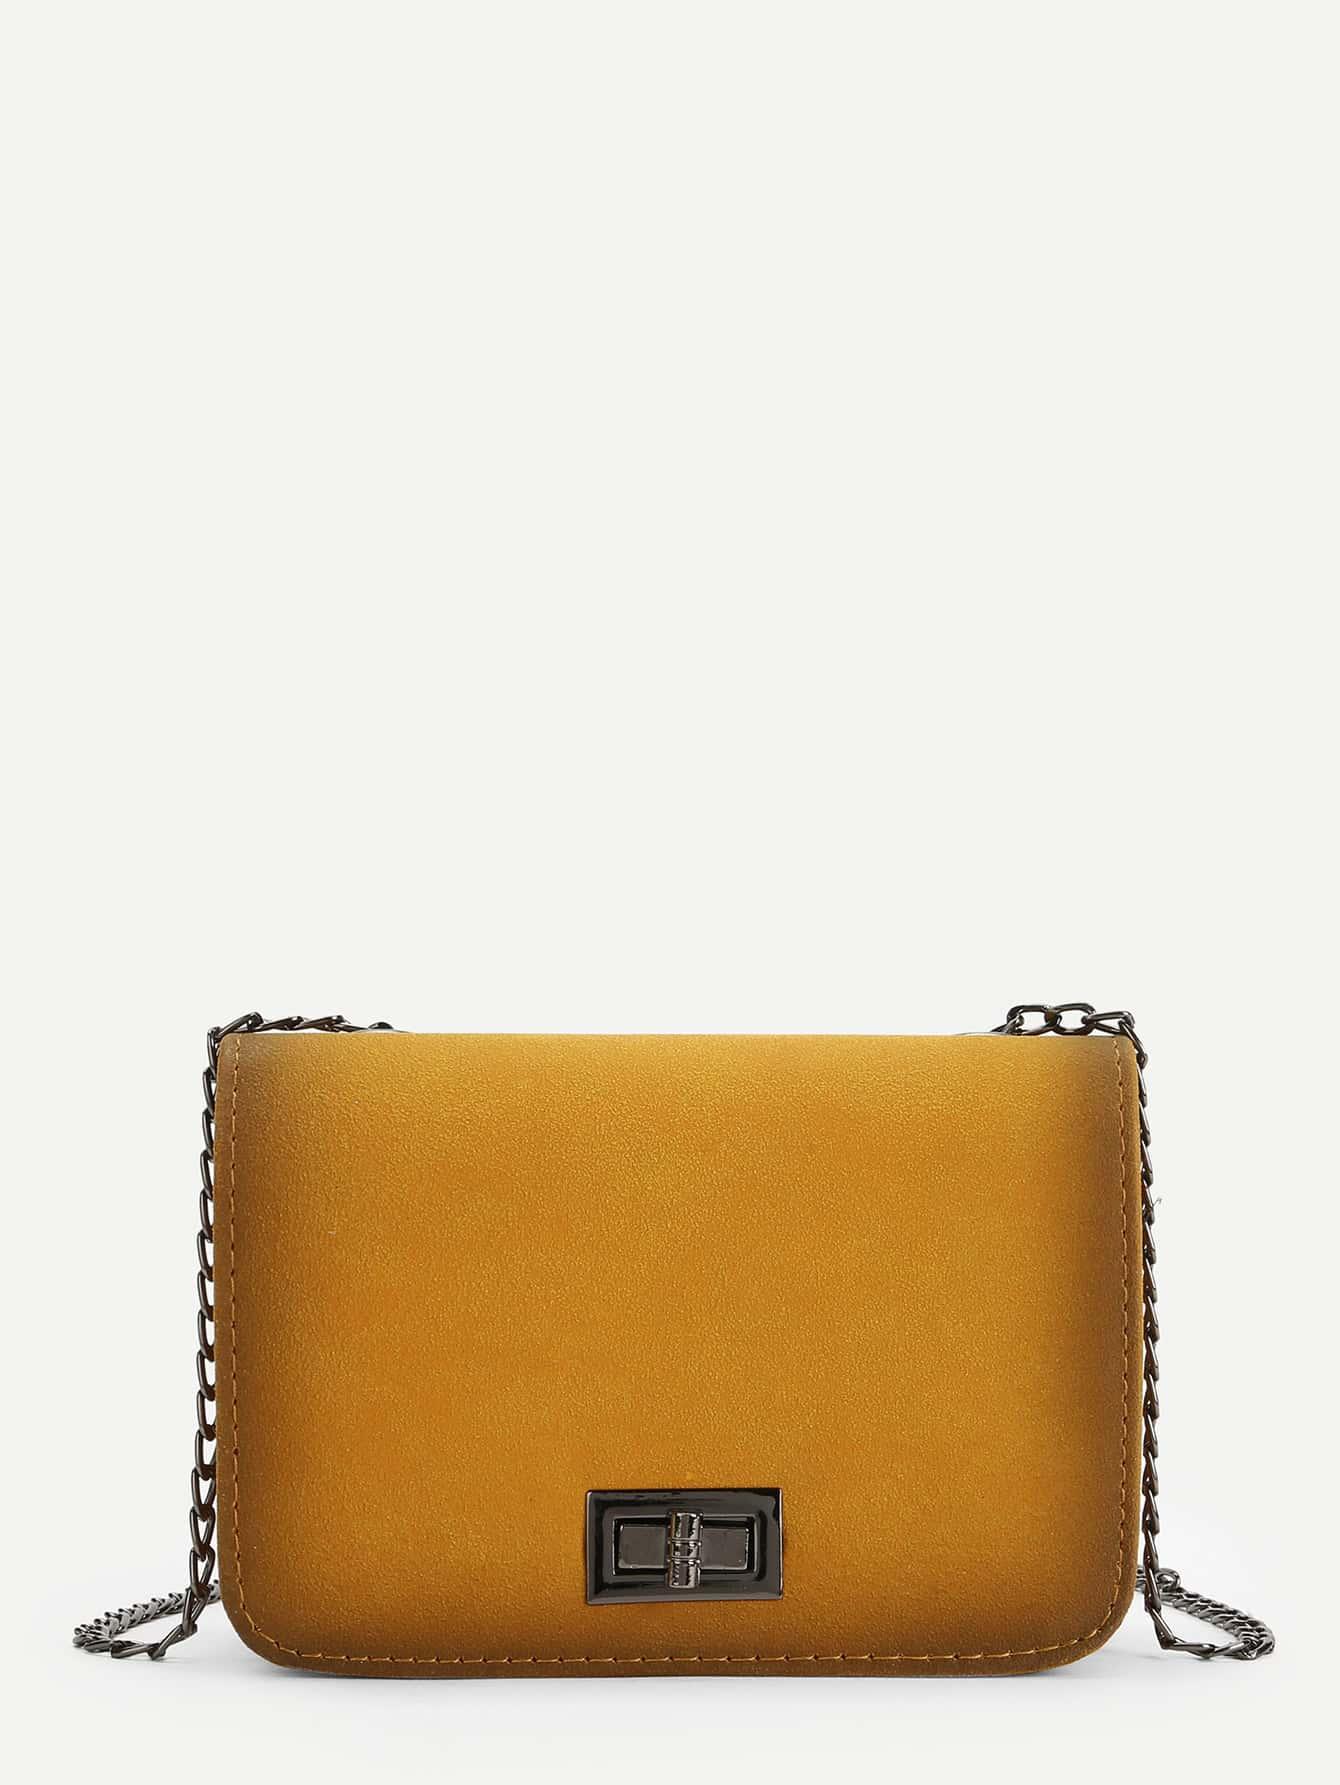 Twist Lock Chain Crossbody Bag 120cm 47 bronze twist o ring bag chain diy metal purse strap 20pcs freeshipping